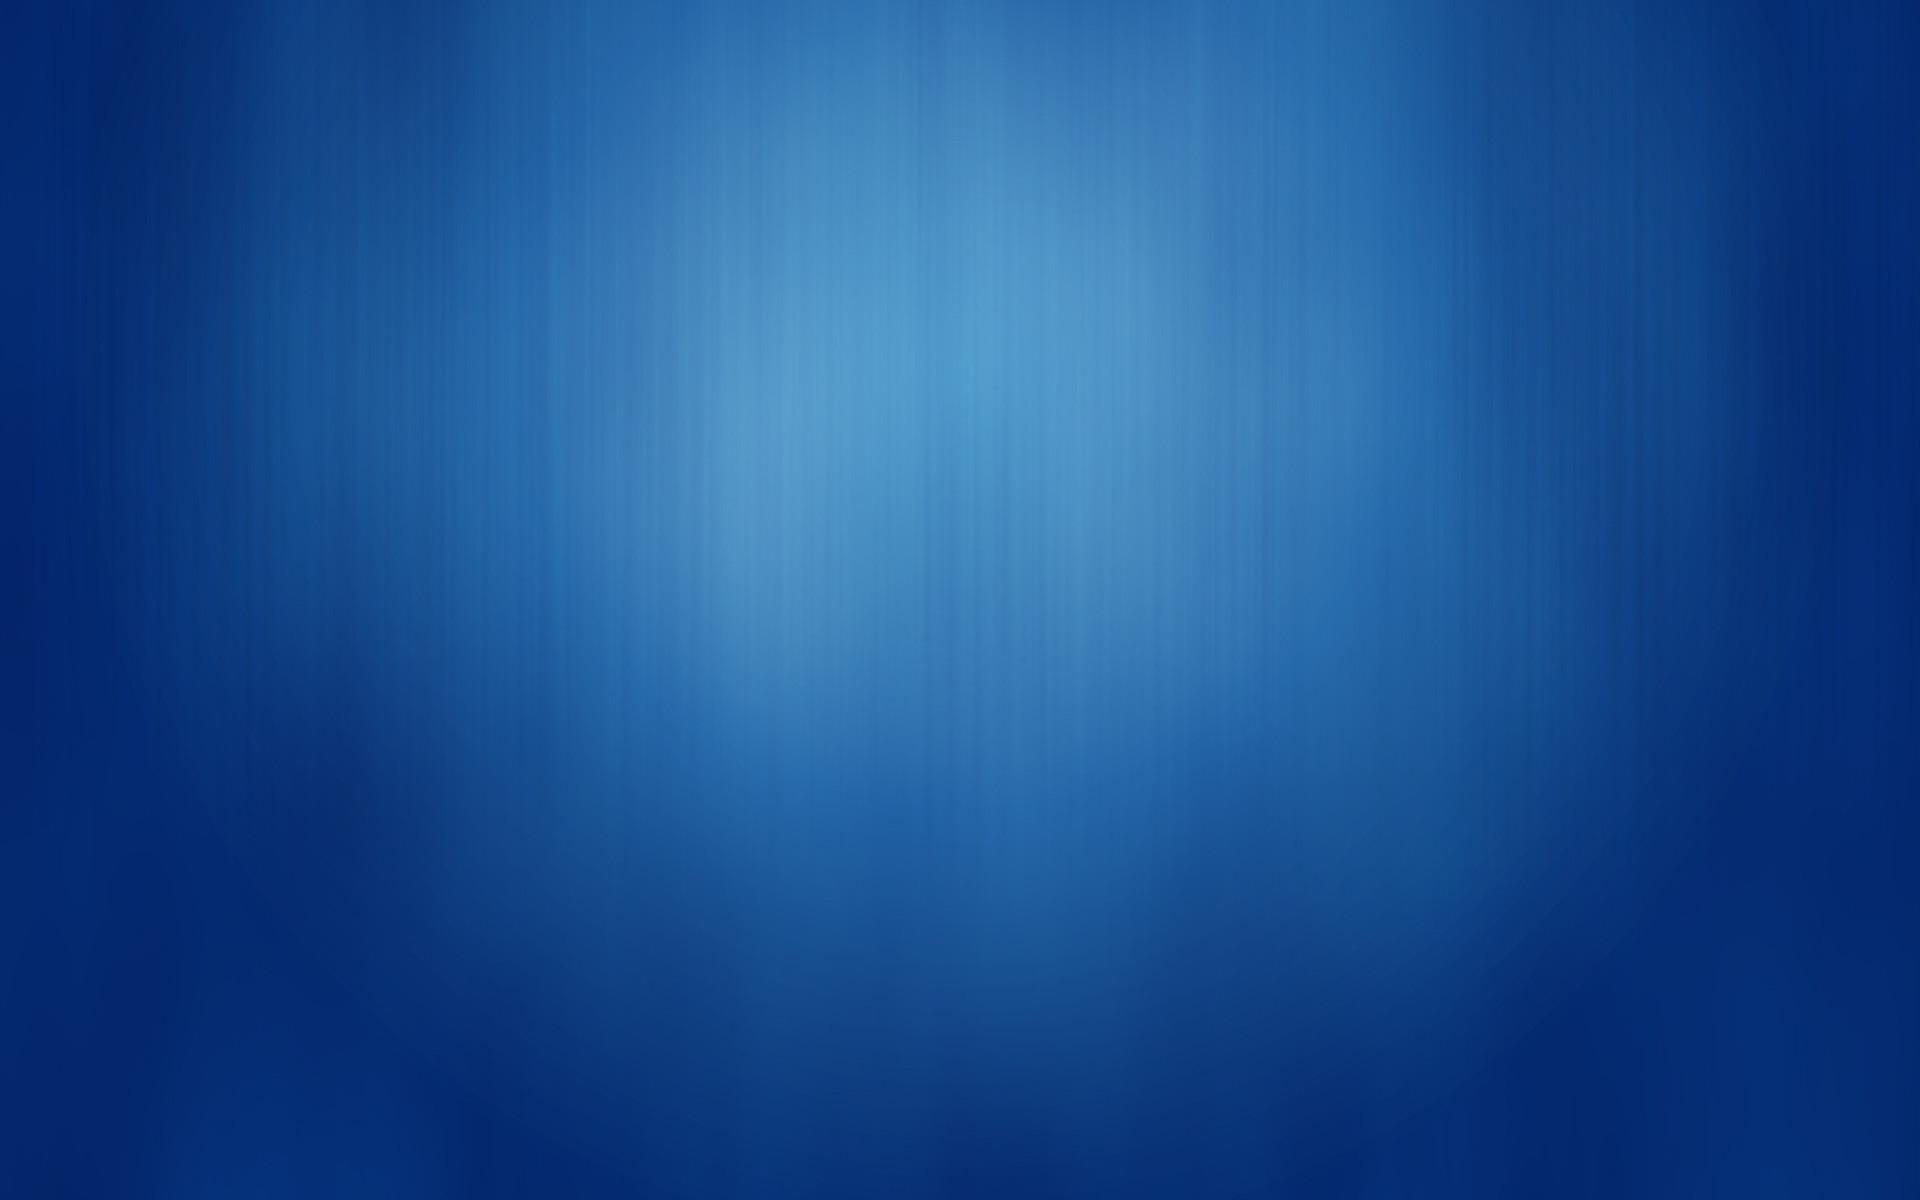 blue – blue wallpaper wallpapernebula